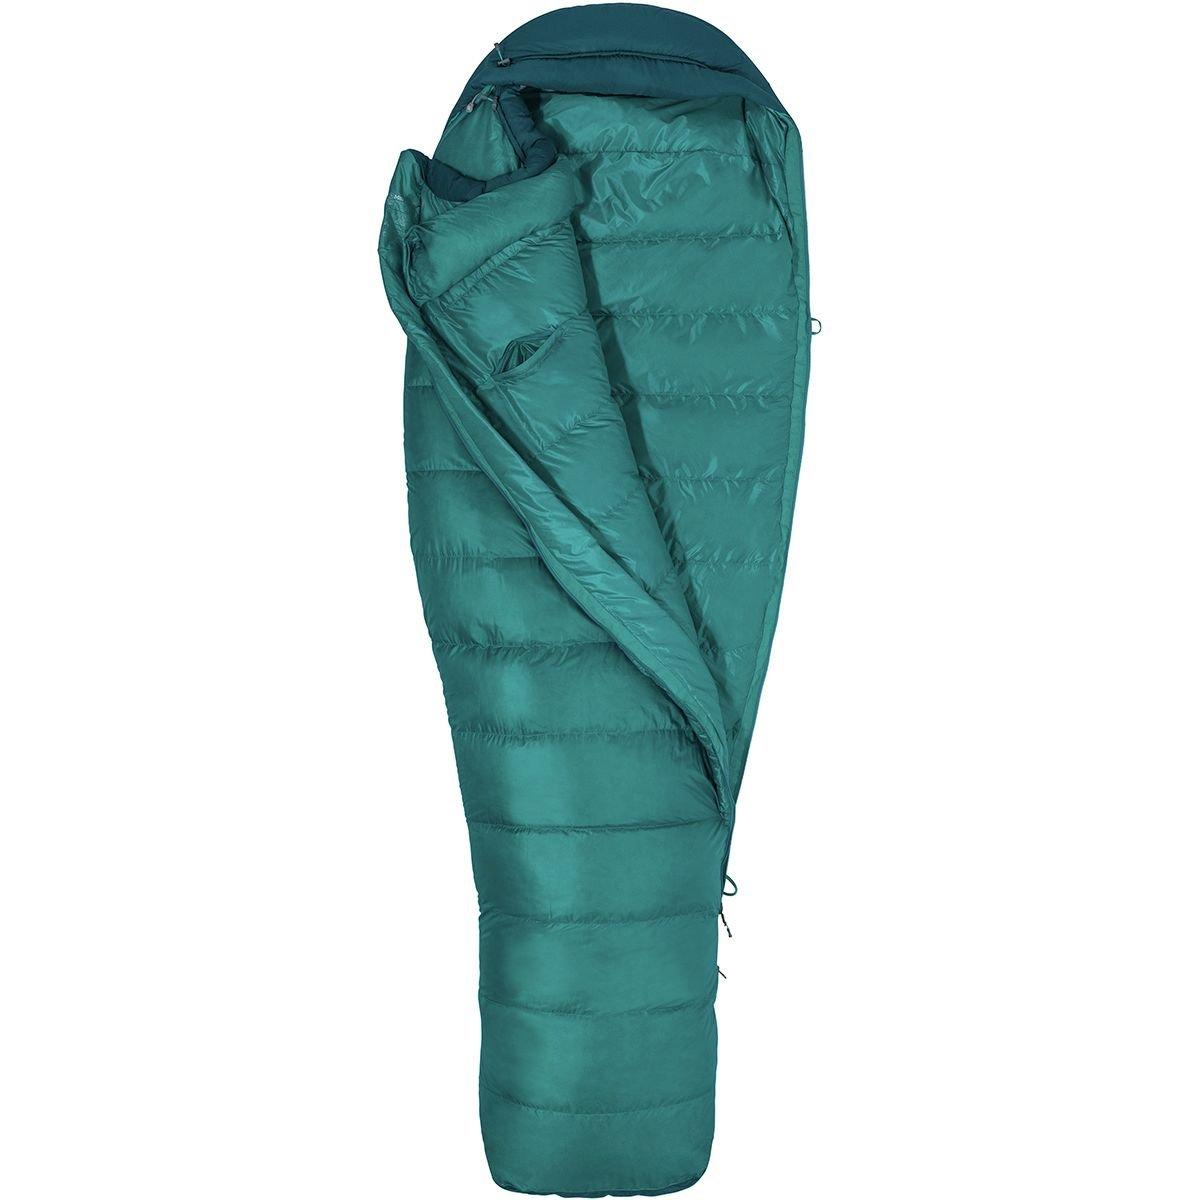 Marmot Angel Fire Sleeping Bag : 25 Degree Down – Women 's Malachite/Deep Teal, Reg/右Zip B078XG3WR1